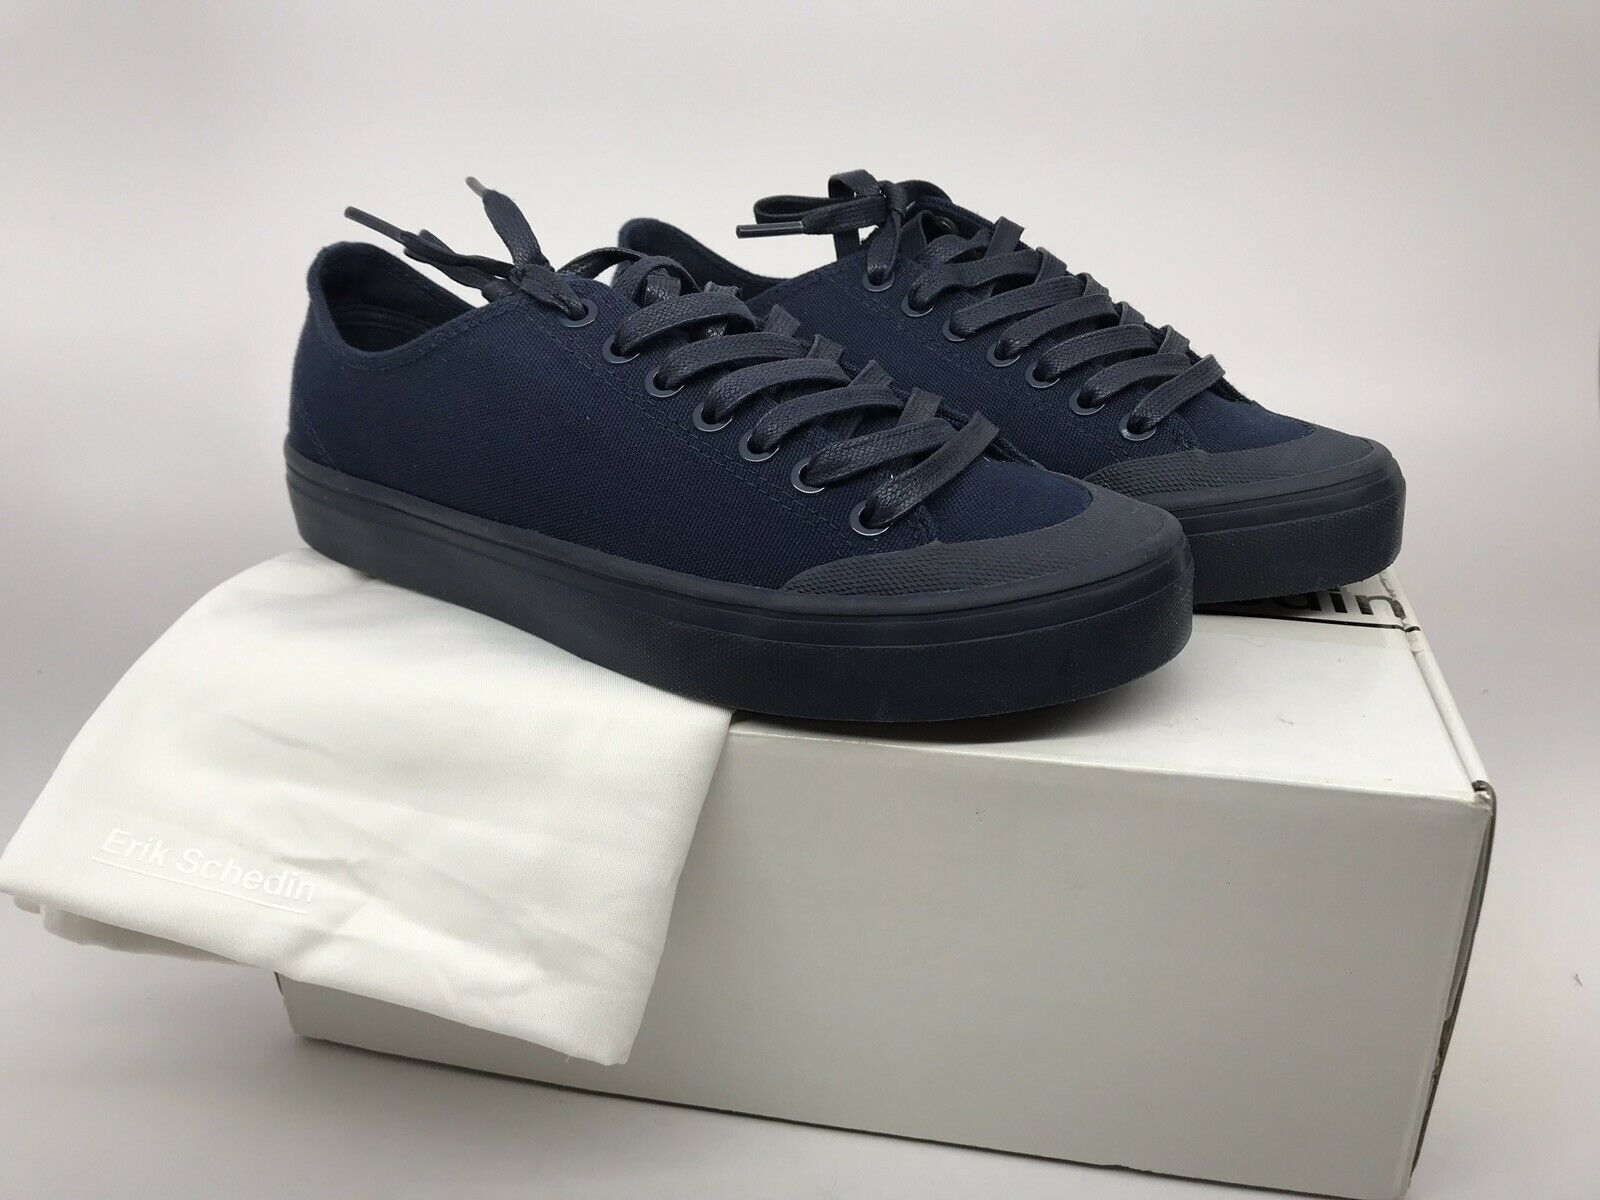 Erik Schedin Womens Canvas Sneaker Size 8.5 Navy bluee NEW